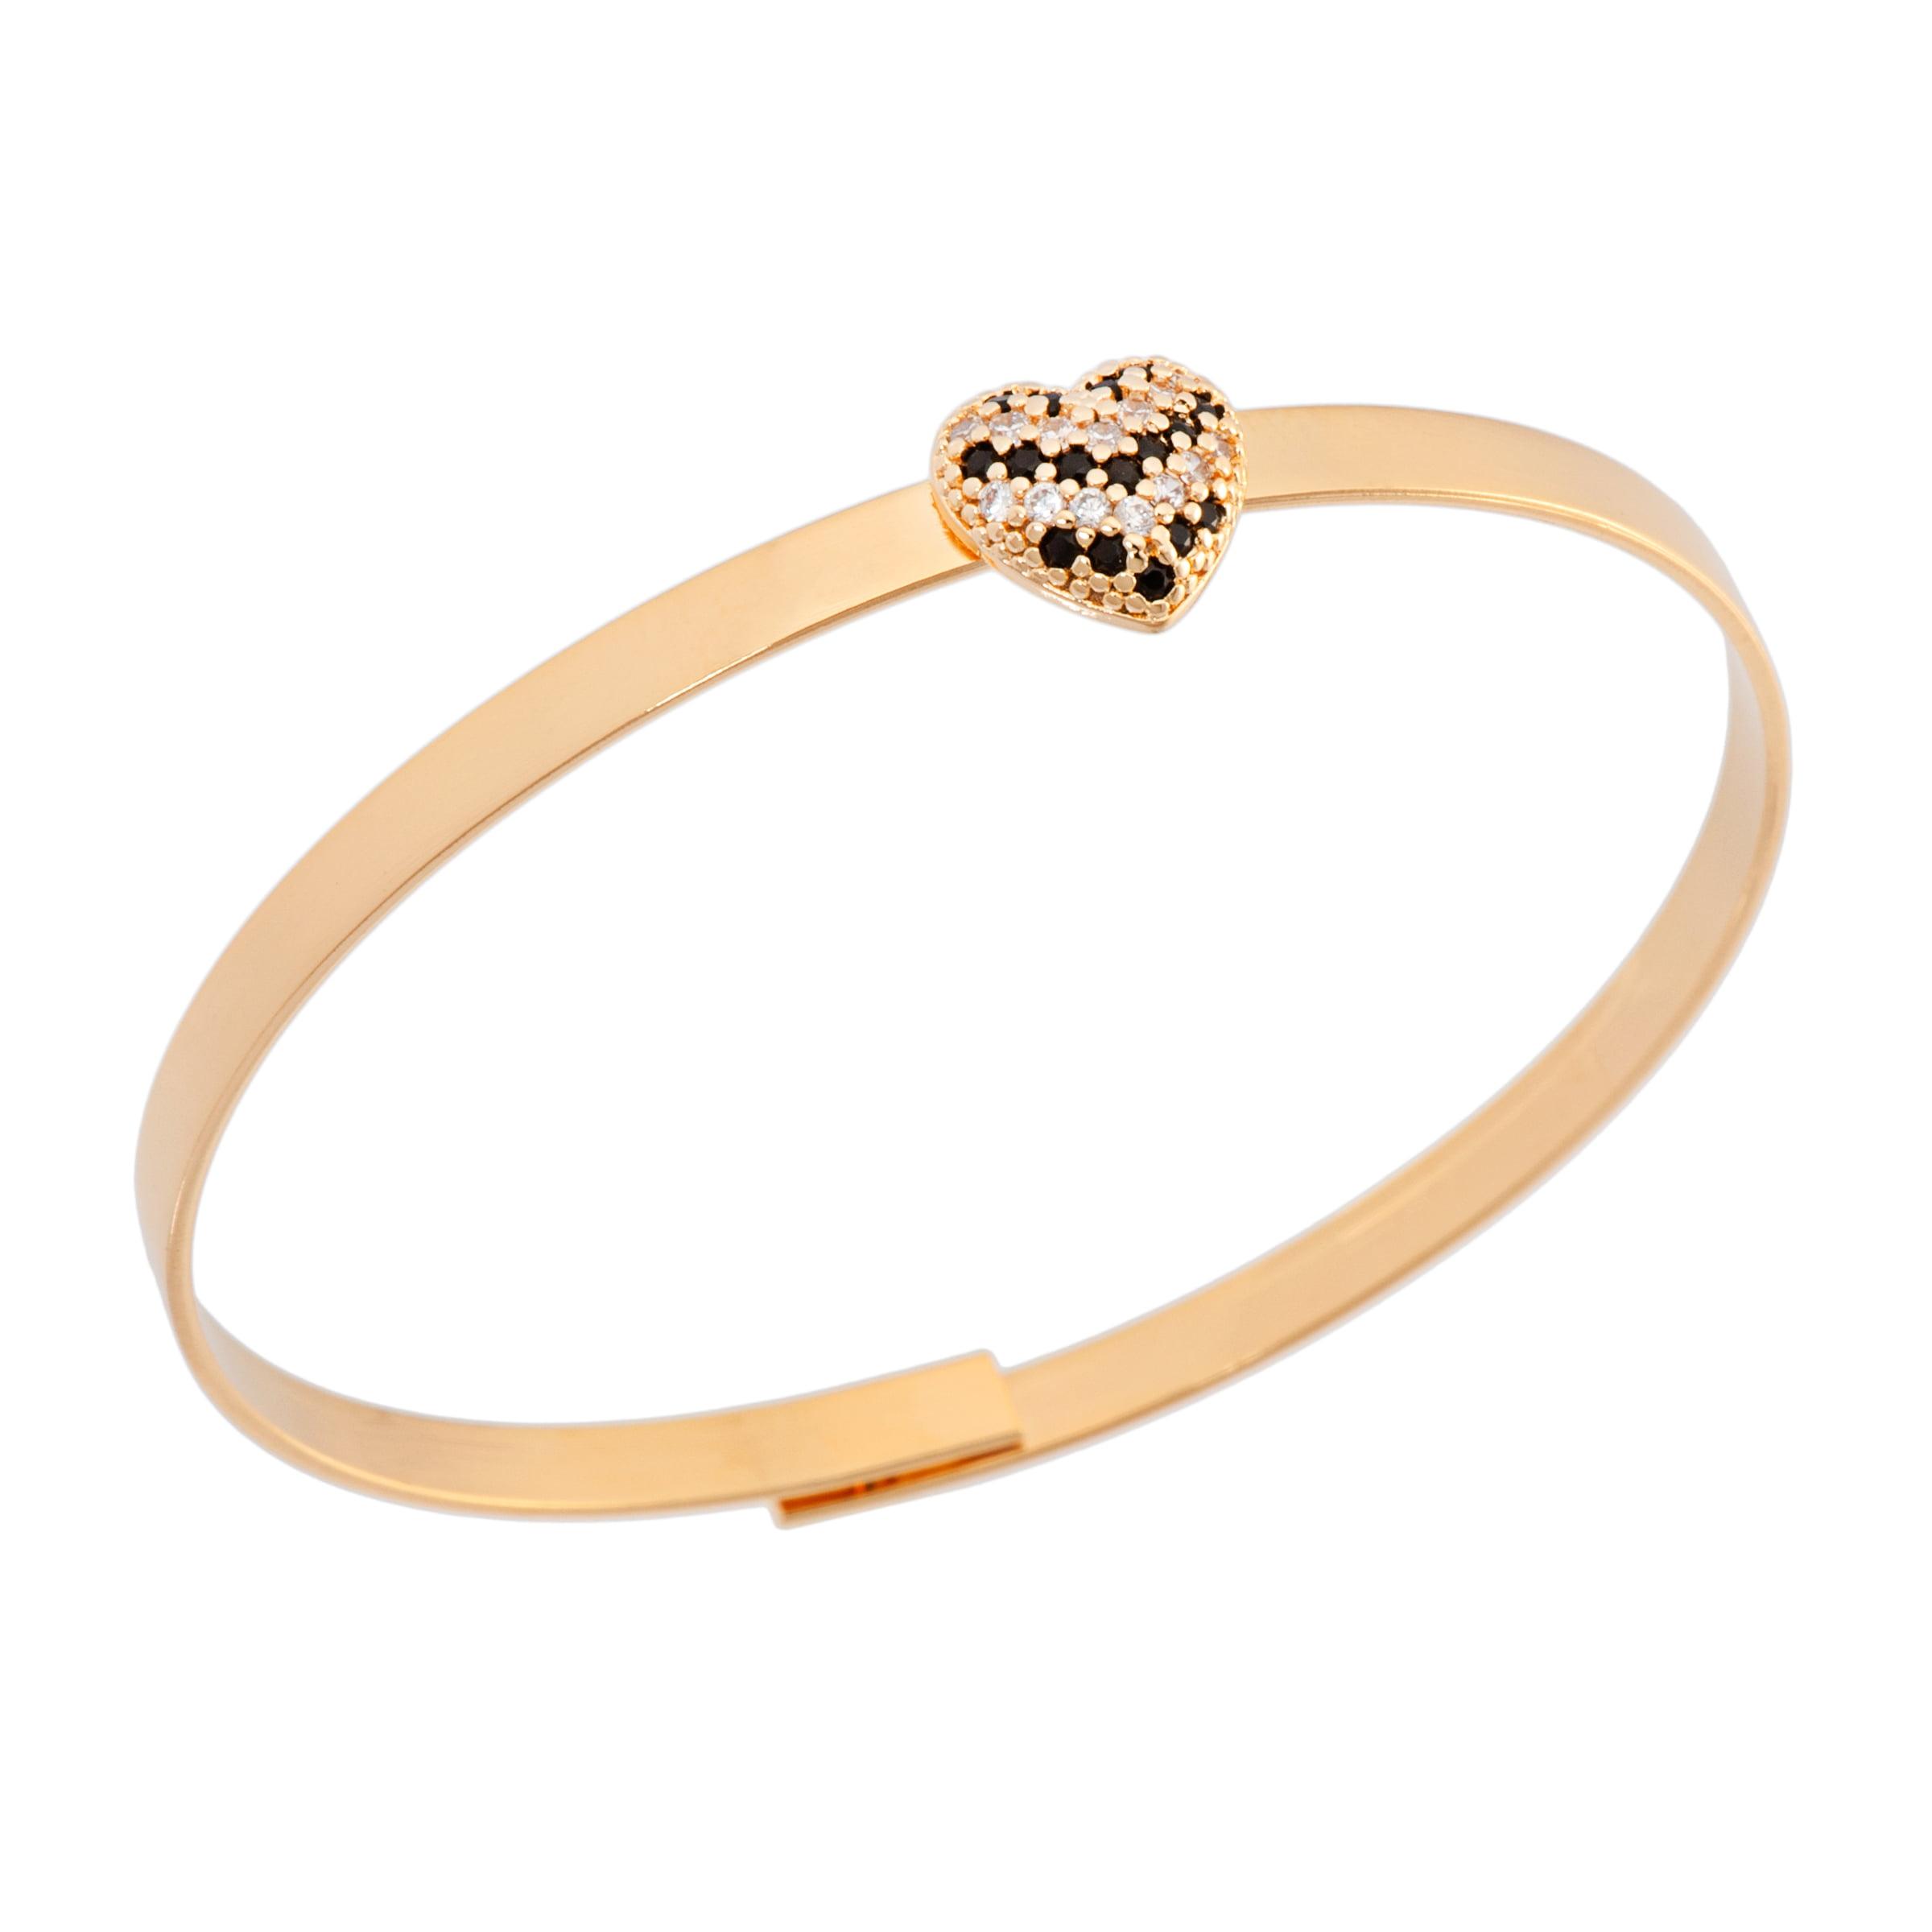 Bracelete Banhado a Ouro Rafalu - PUL0001K